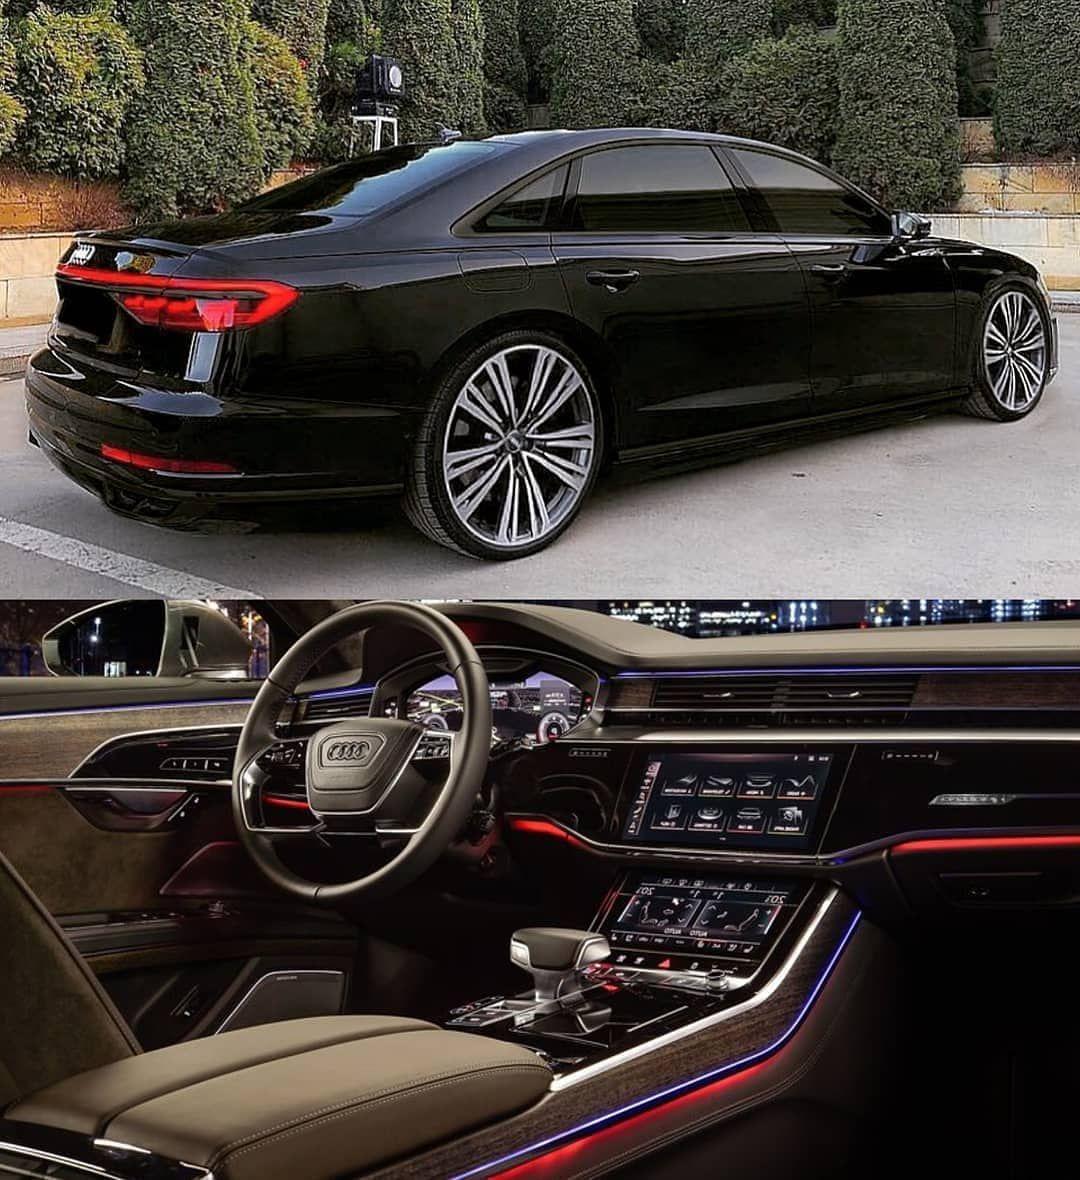 New Audi A8l 2019 Full Black Via Superautos365 Follow Uber Luxury For More Audi Audi Cars Luxury Cars